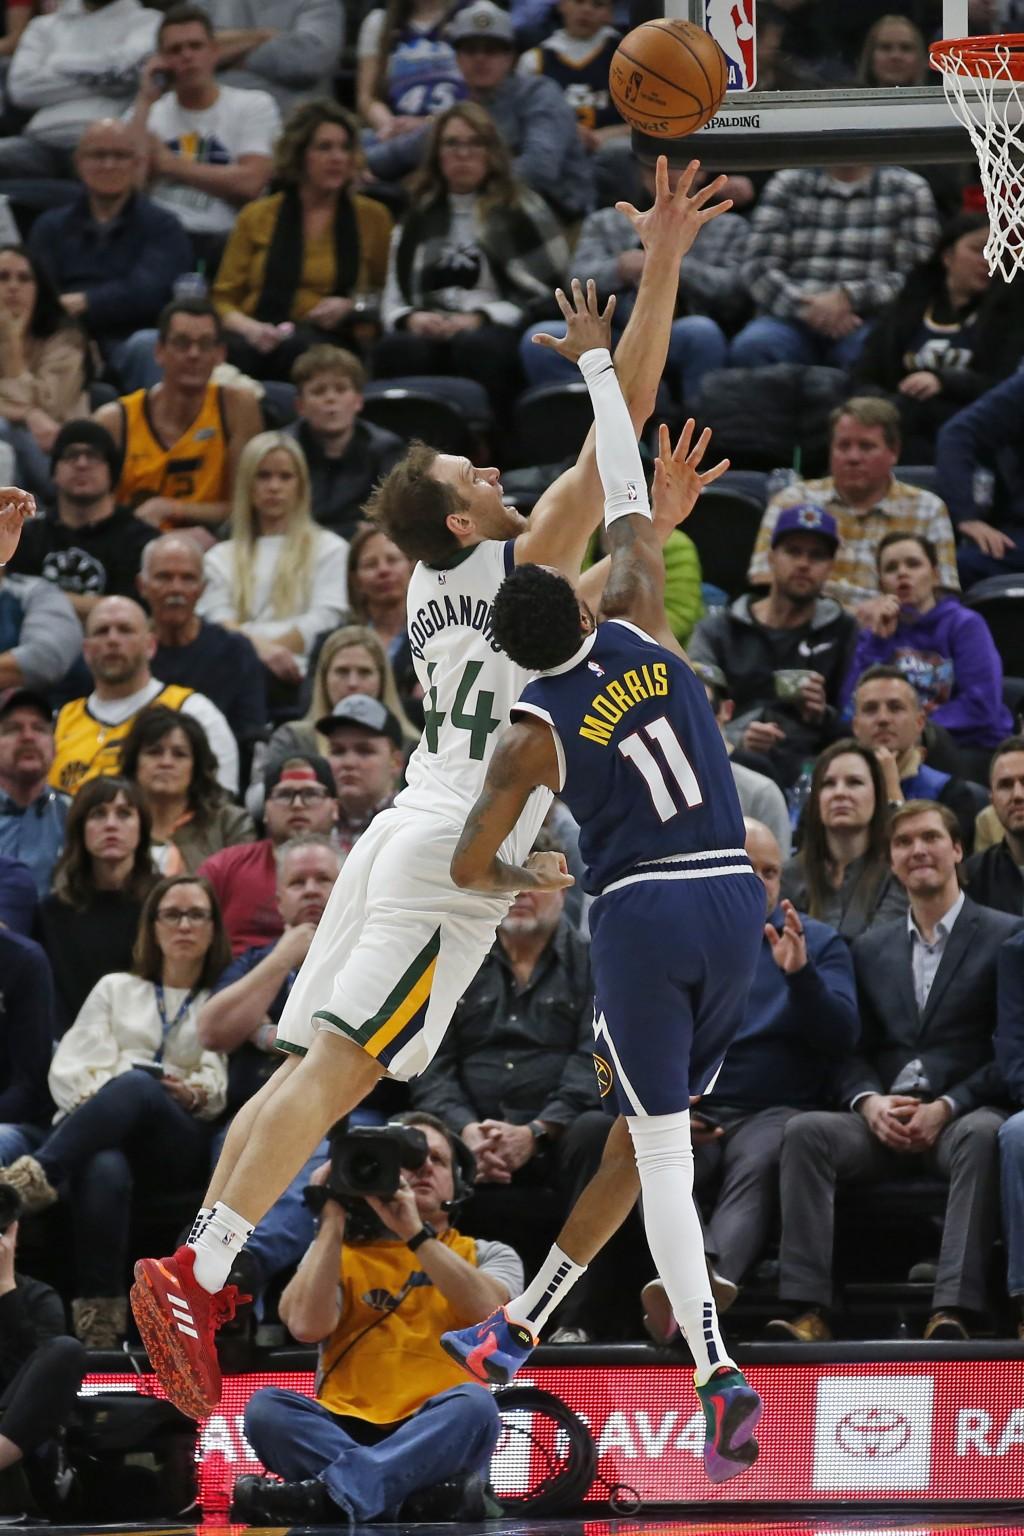 Utah Jazz forward Bojan Bogdanovic (44) goes to the basket as Denver Nuggets guard Monte Morris (11) defends in the first half during an NBA basketbal...